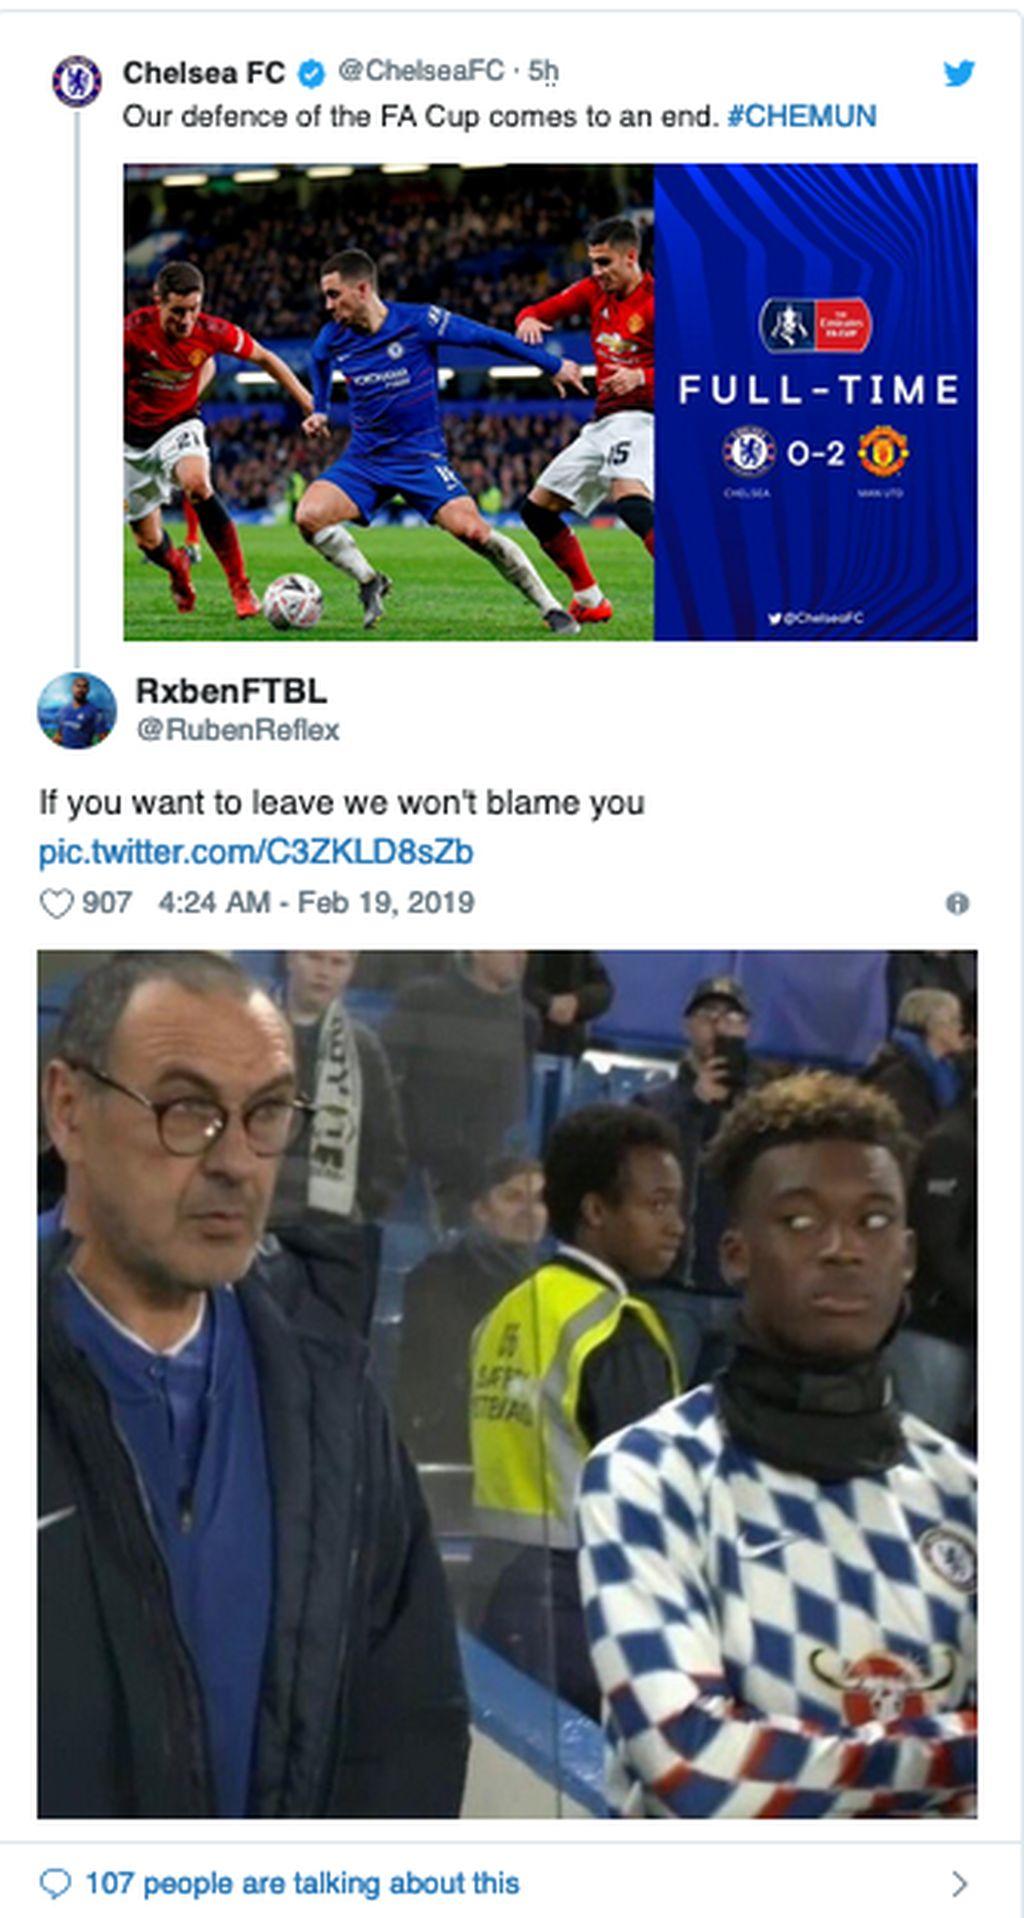 Chelsea kalah 0-2 dari MU dan tersingkir dari Piala FA. Sarri jadi sorotan utama. (Foto: Internet/Twitter)